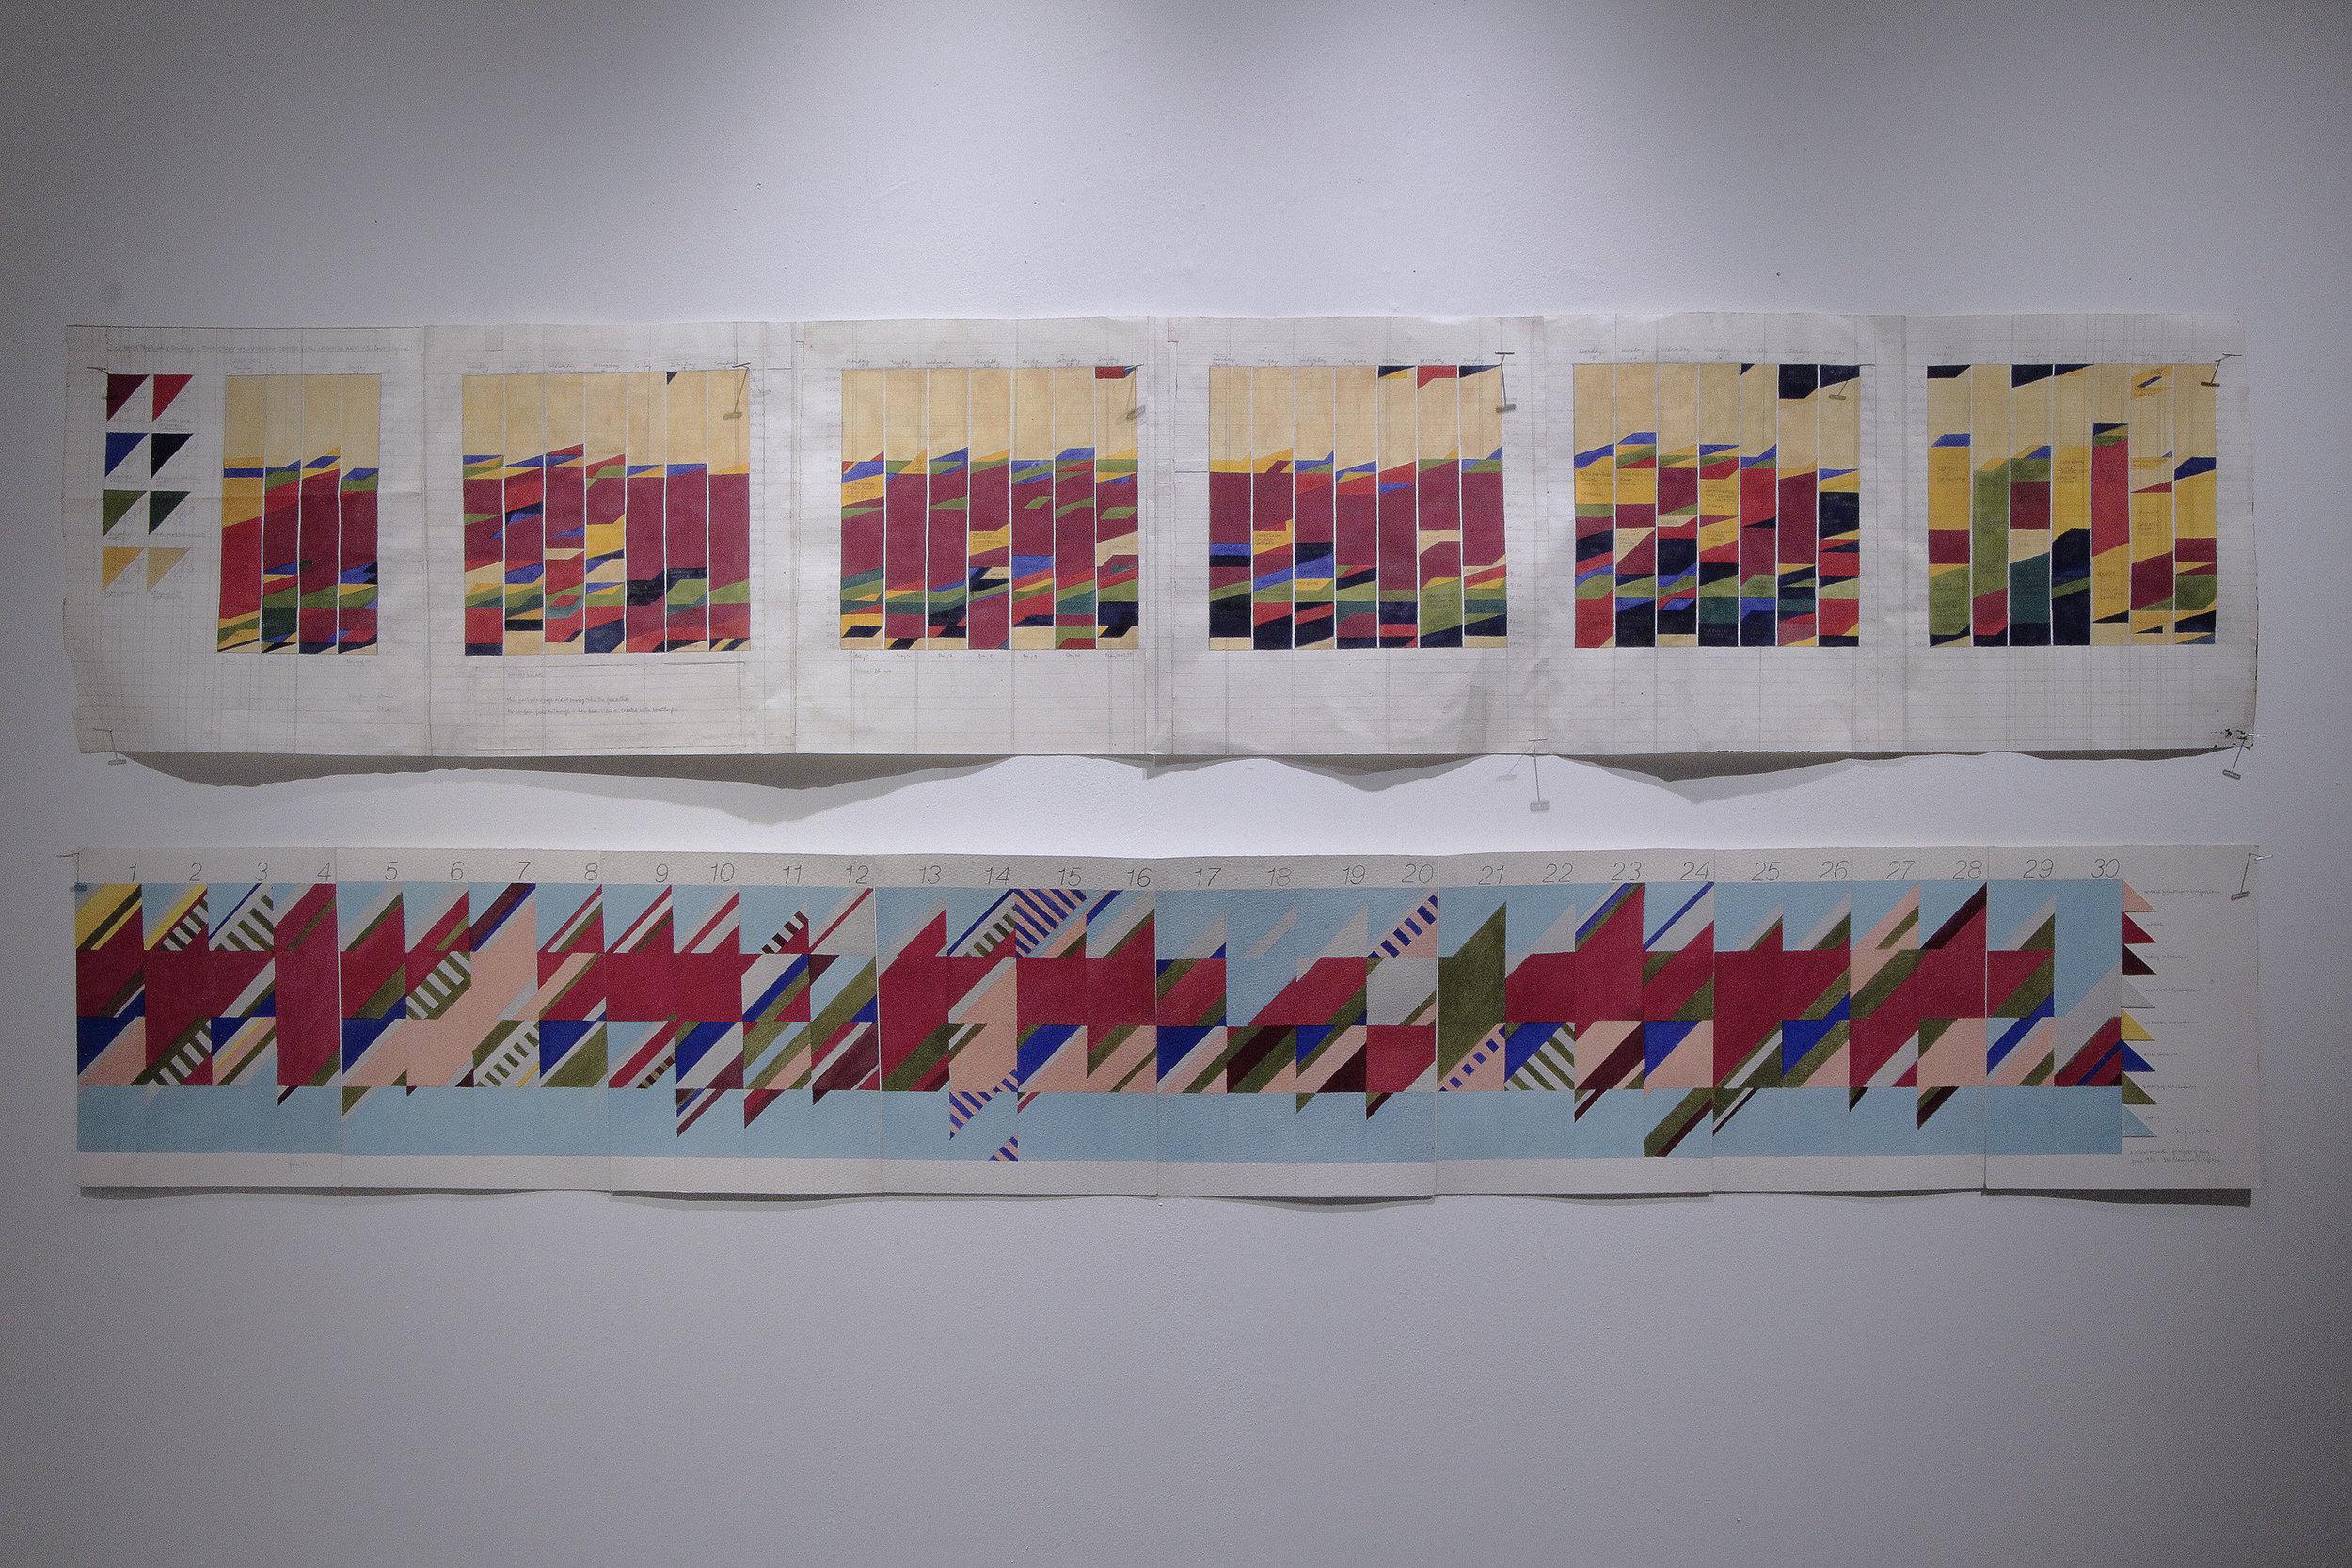   上 Top    時間研究:二零一二年七月到八月  Time Study: July to August, 2012  32 x 161.5cm / 12.6 x 63.6inches  水粉、鉛筆與紙張/Gouache and graphite on paper      下Bottom    時間研究:一九九二年六月,舊金山  Time Study:June, 1992, San Francisco  25.5 x 159cm / 10 x 62.6inches  水粉、鉛筆與紙張/Gouacheand graphite on paper